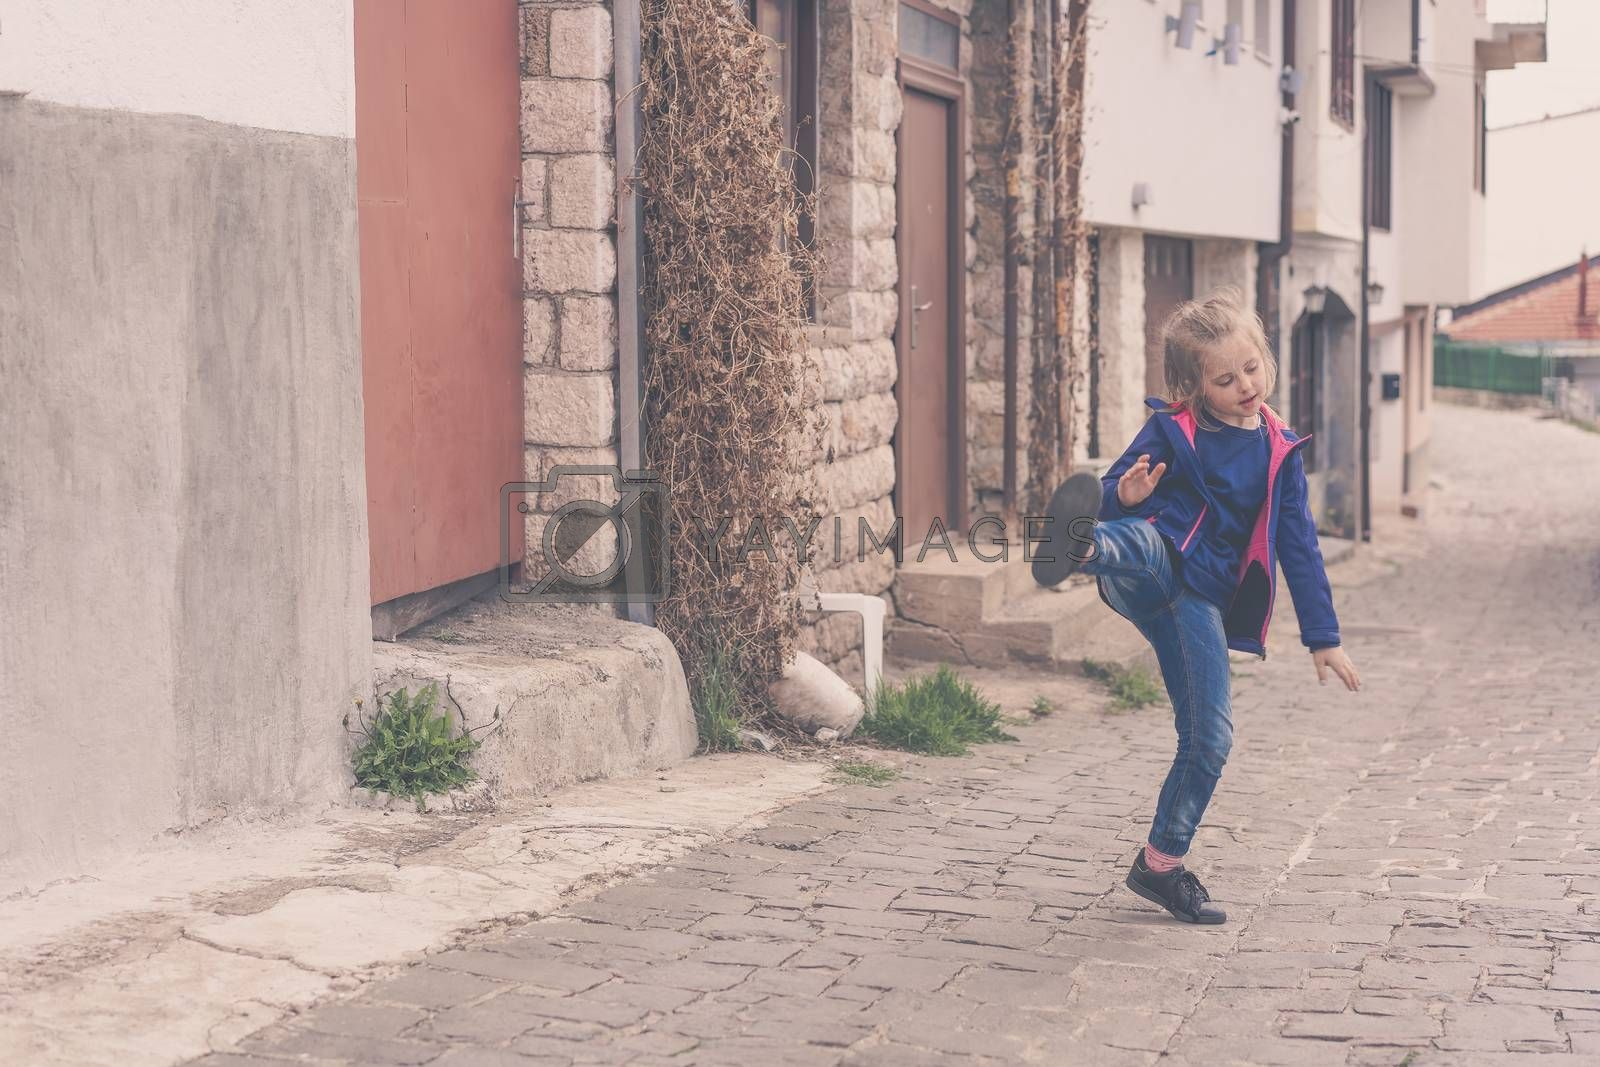 Little girl having fun practising kicks on a street in Ohrid, Northern Macedonia